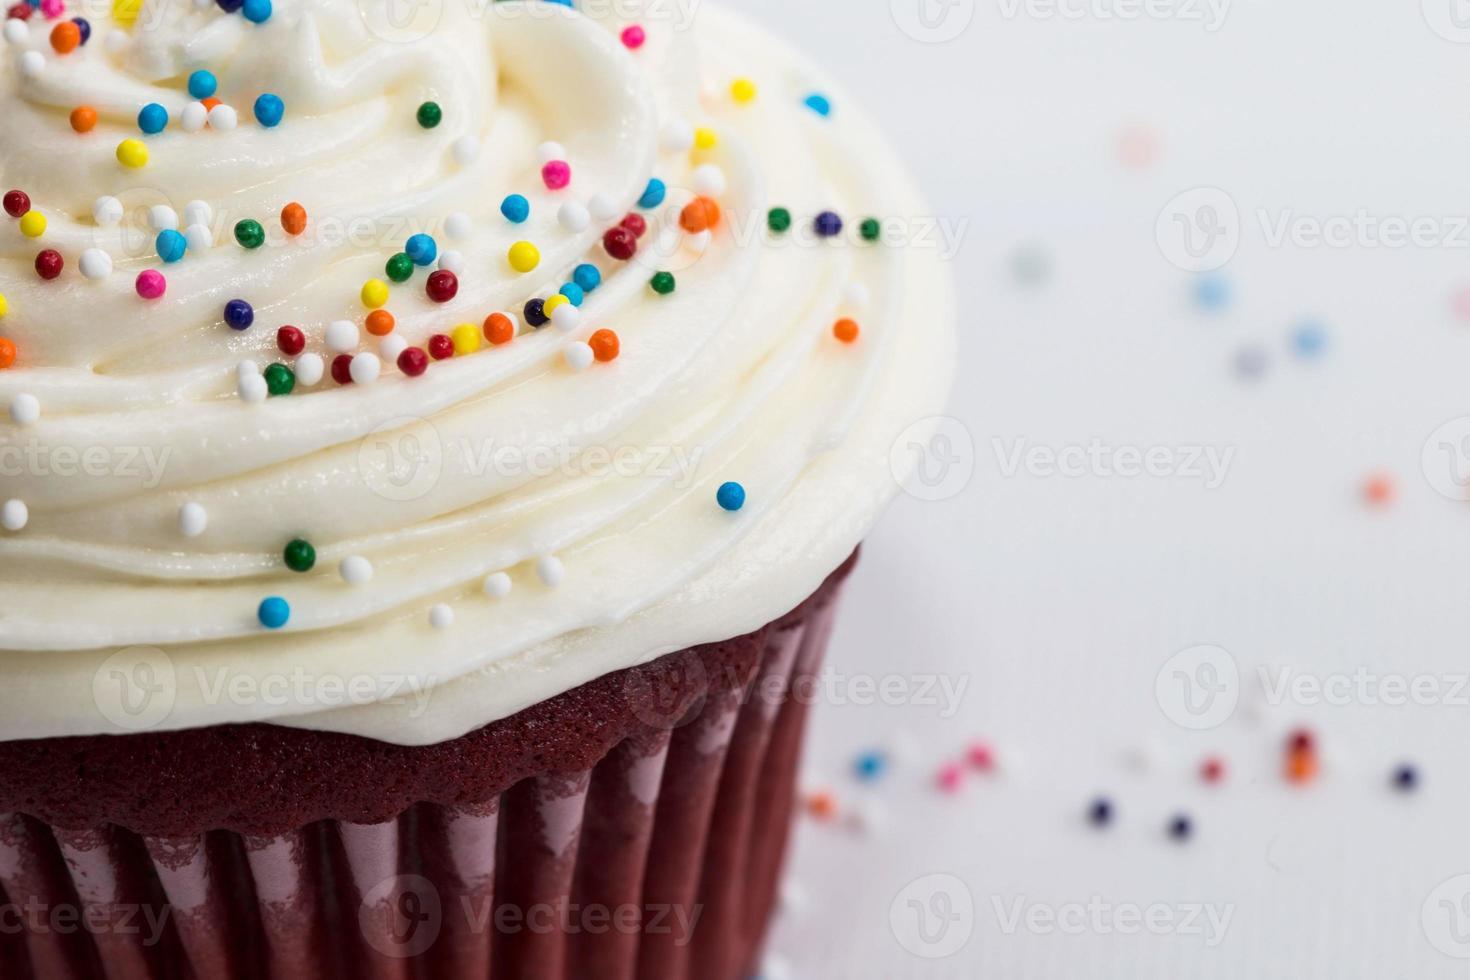 strooi cupcake dicht omhoog foto